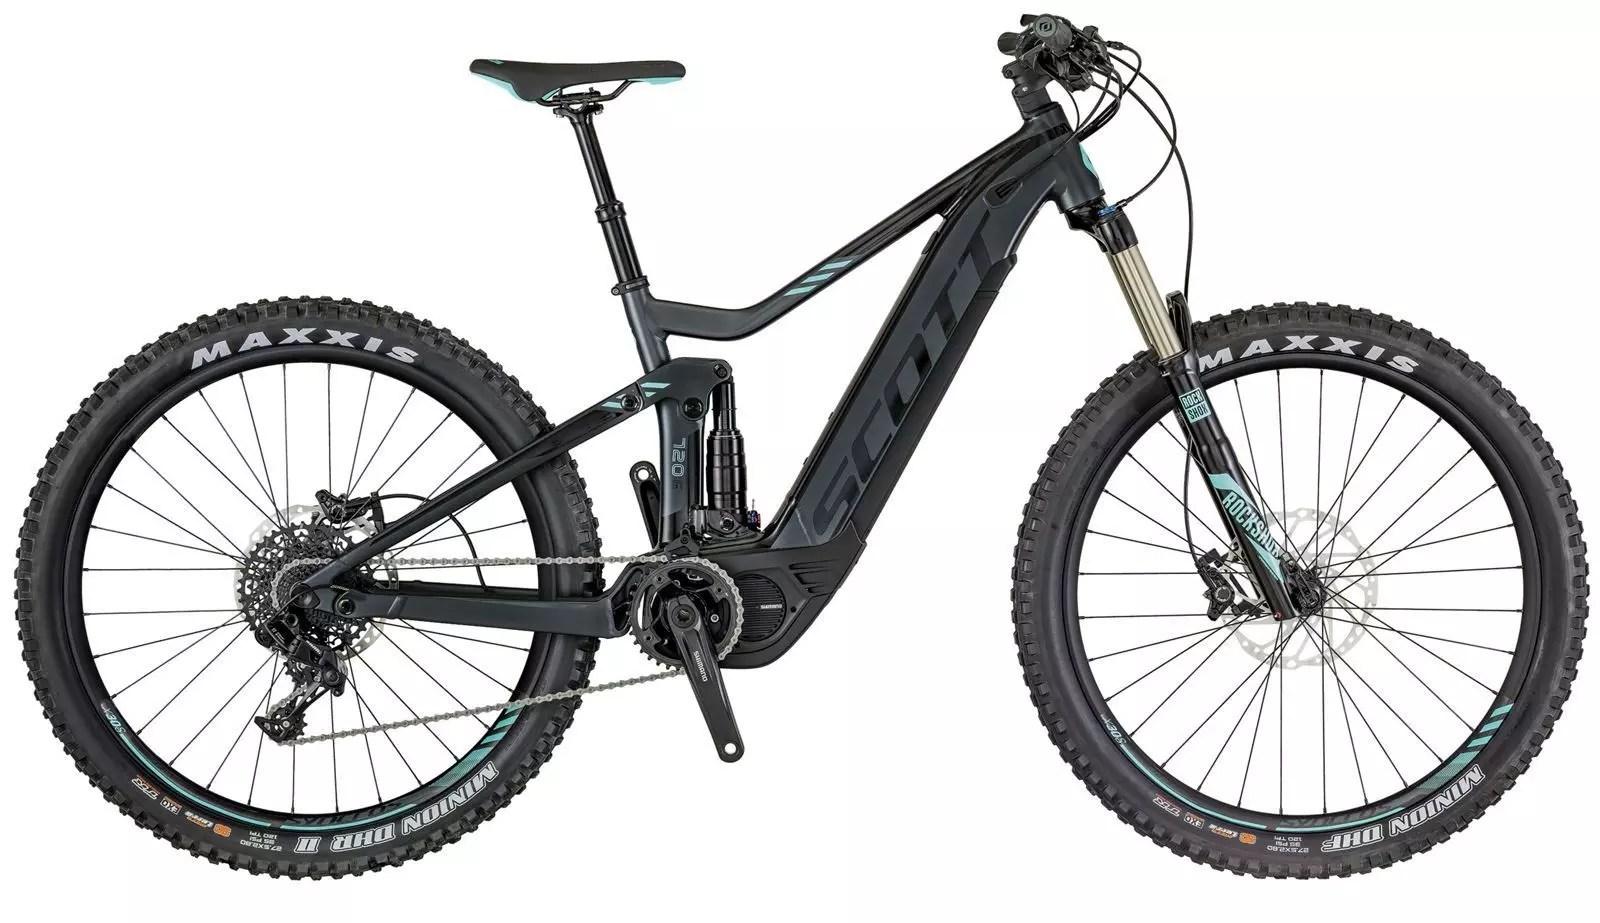 Scott Bicicletta Elettrica E-Contessa Genius 720 2018